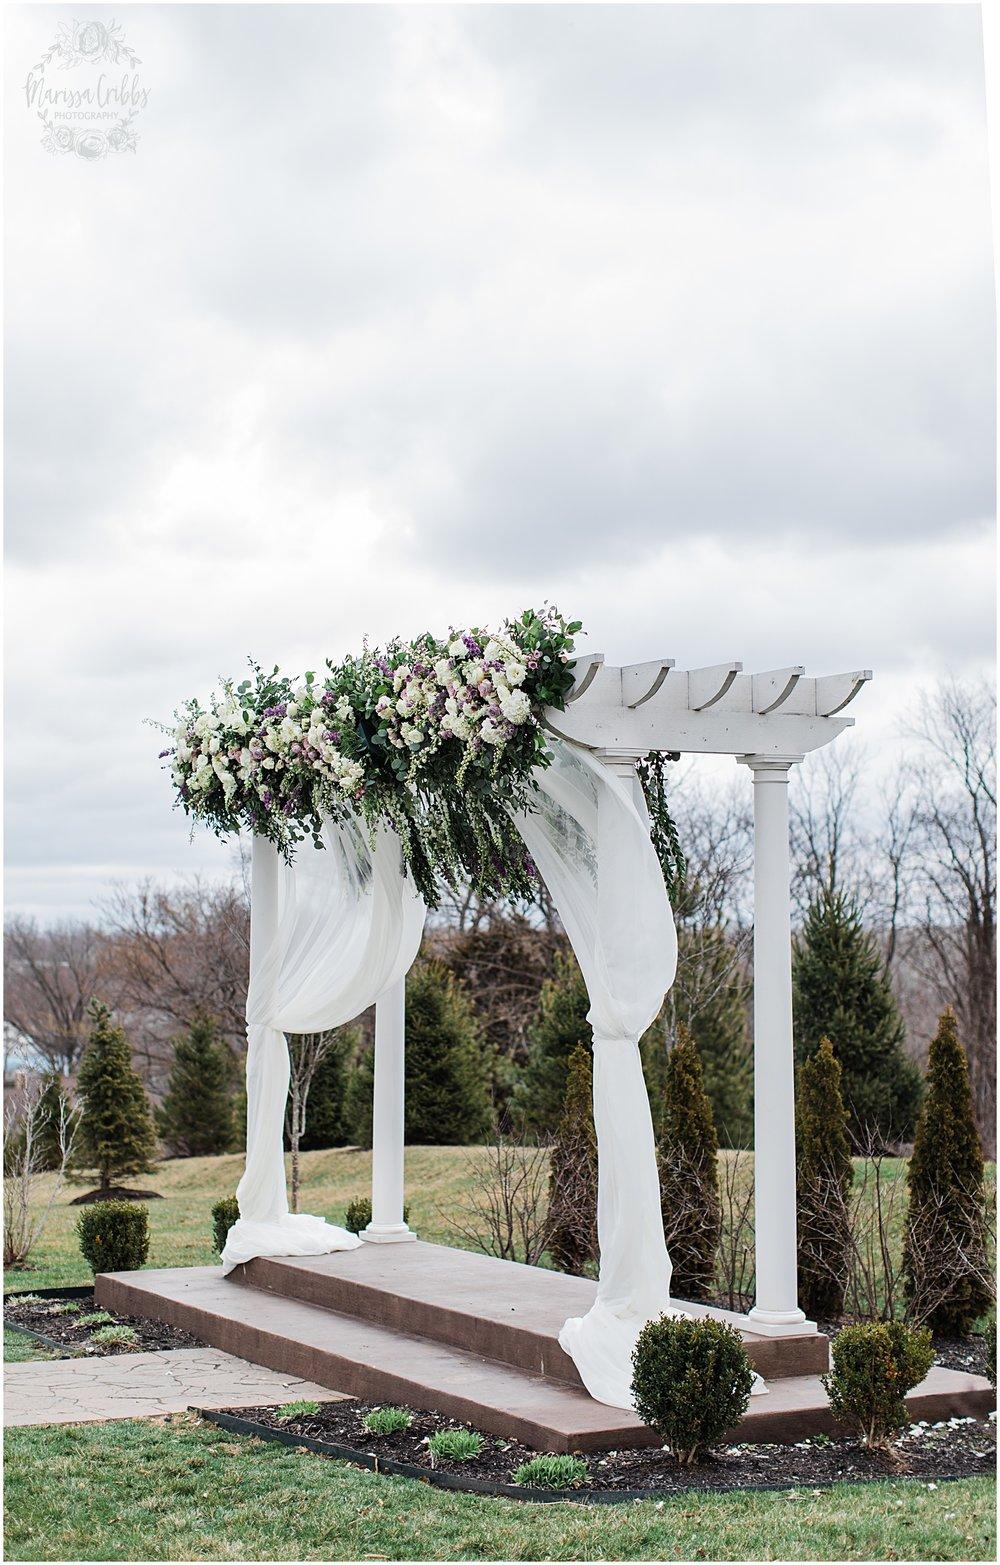 JACOBI WEDDING | 1890 EVENT SPACE | MARISSA CRIBBS PHOTOGRAPHY_4308.jpg